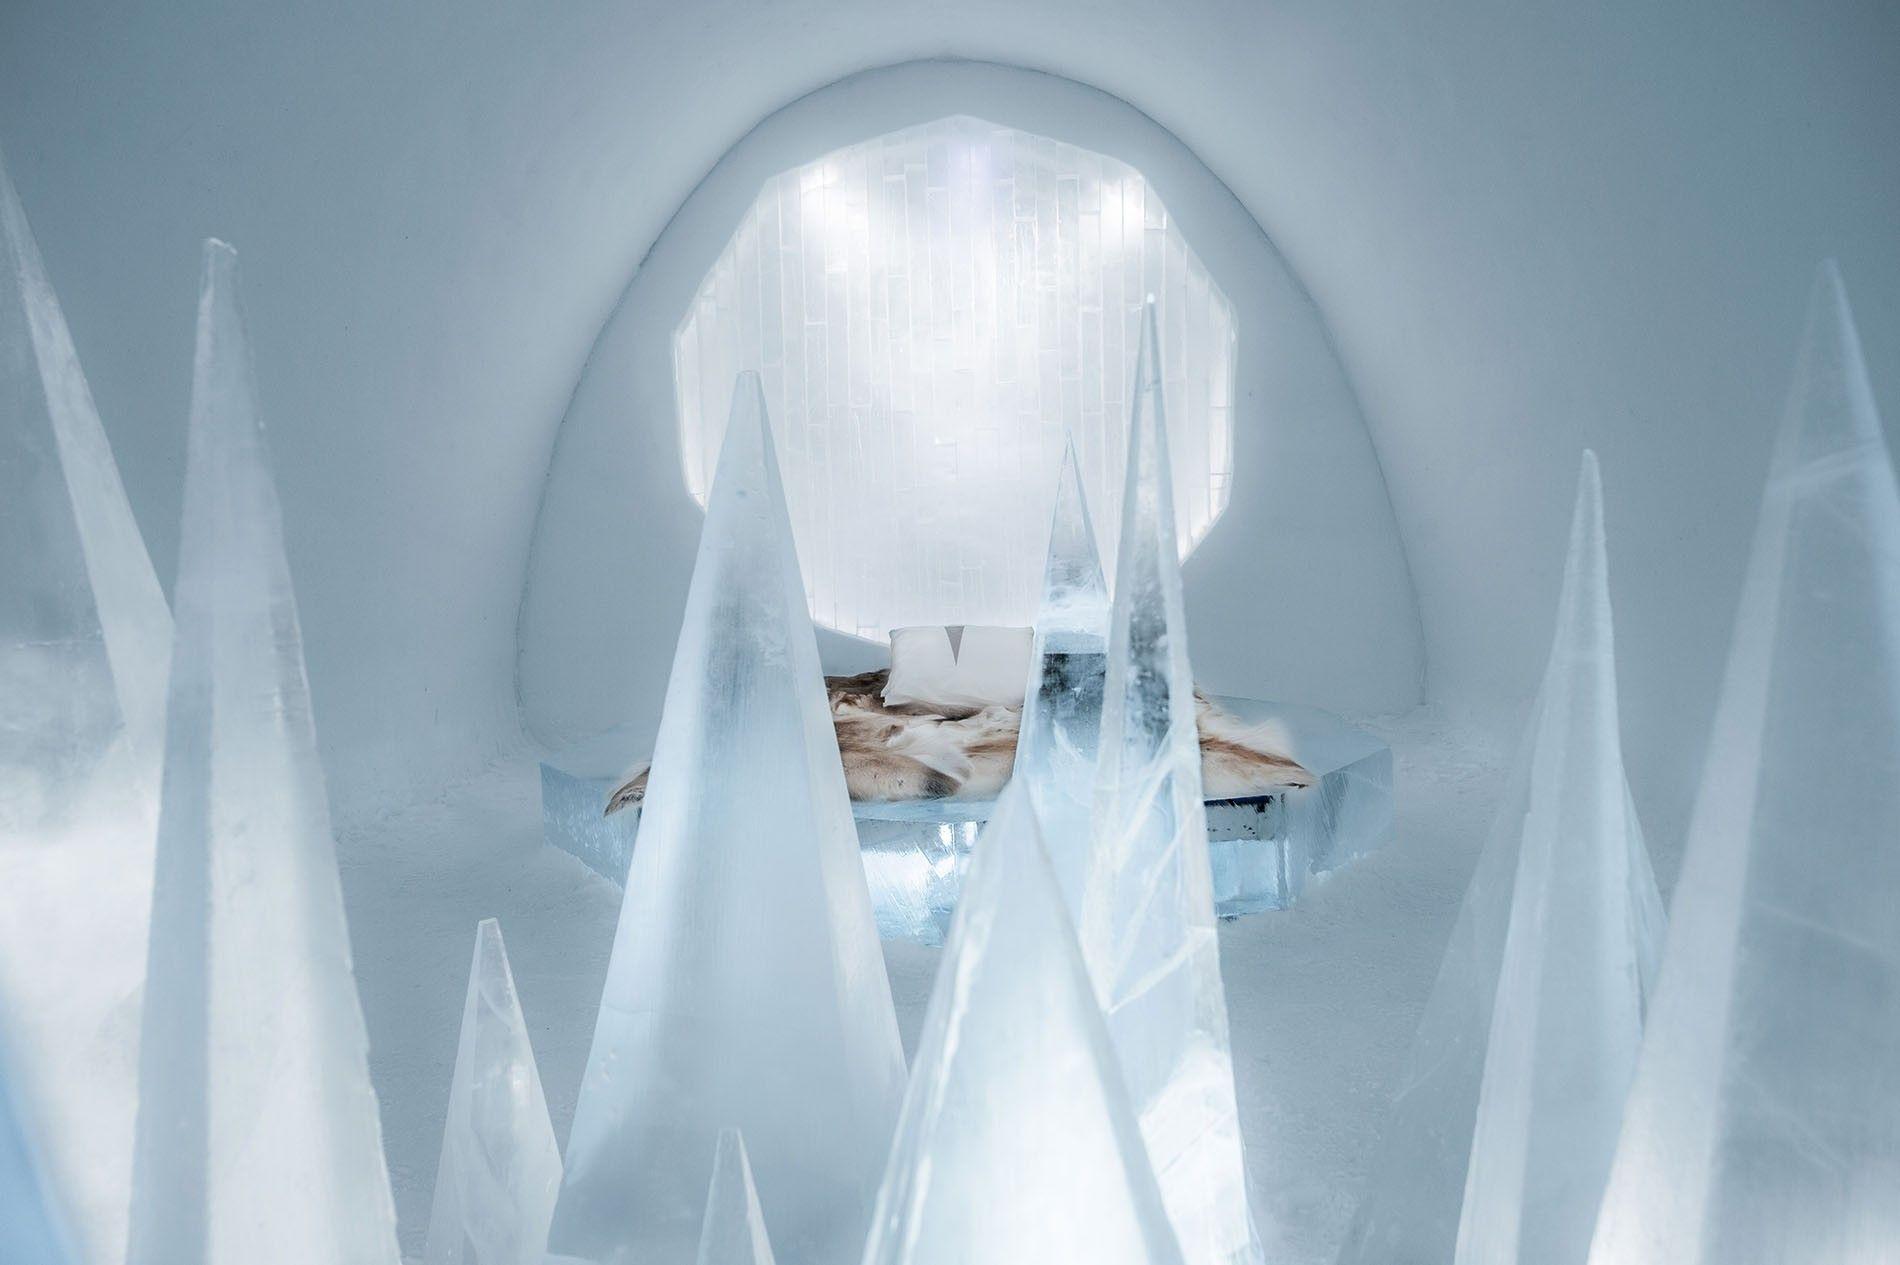 The super-cool art suite at Icehotel in Jukkasjärvi.